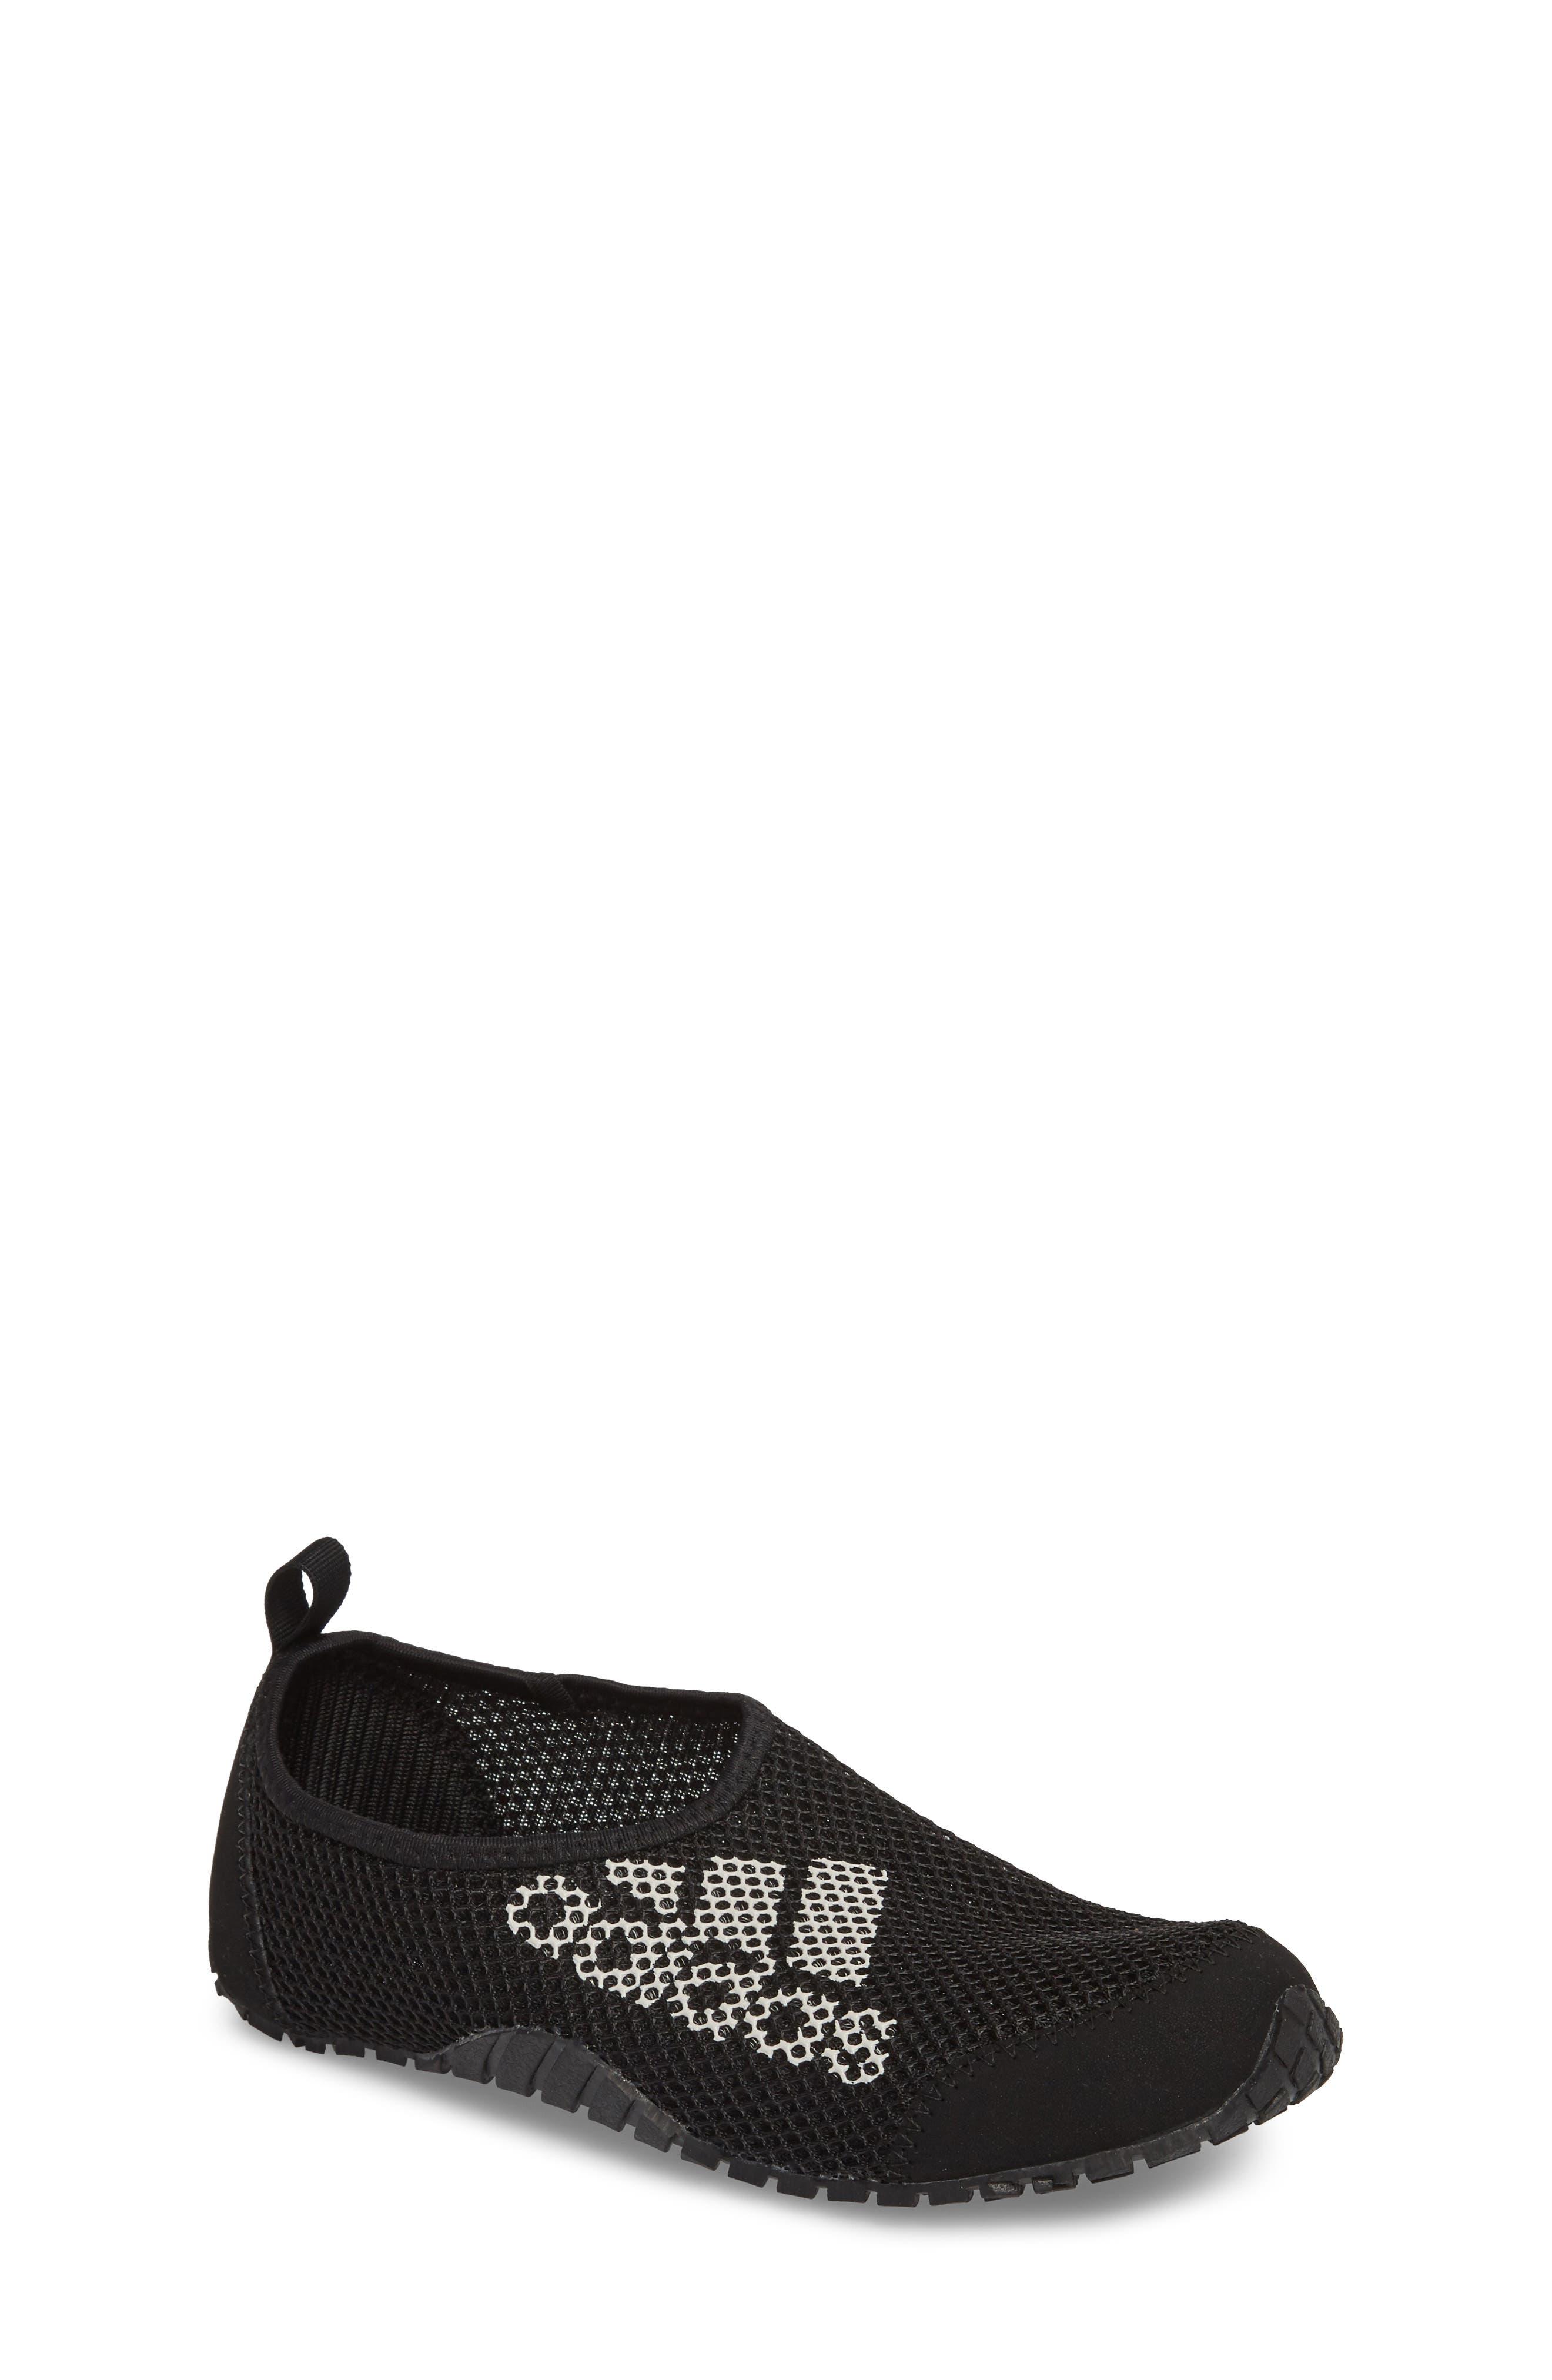 Kurobe Mesh Slip-On Water Shoe,                         Main,                         color, BLACK/ BLACK GREY ONE